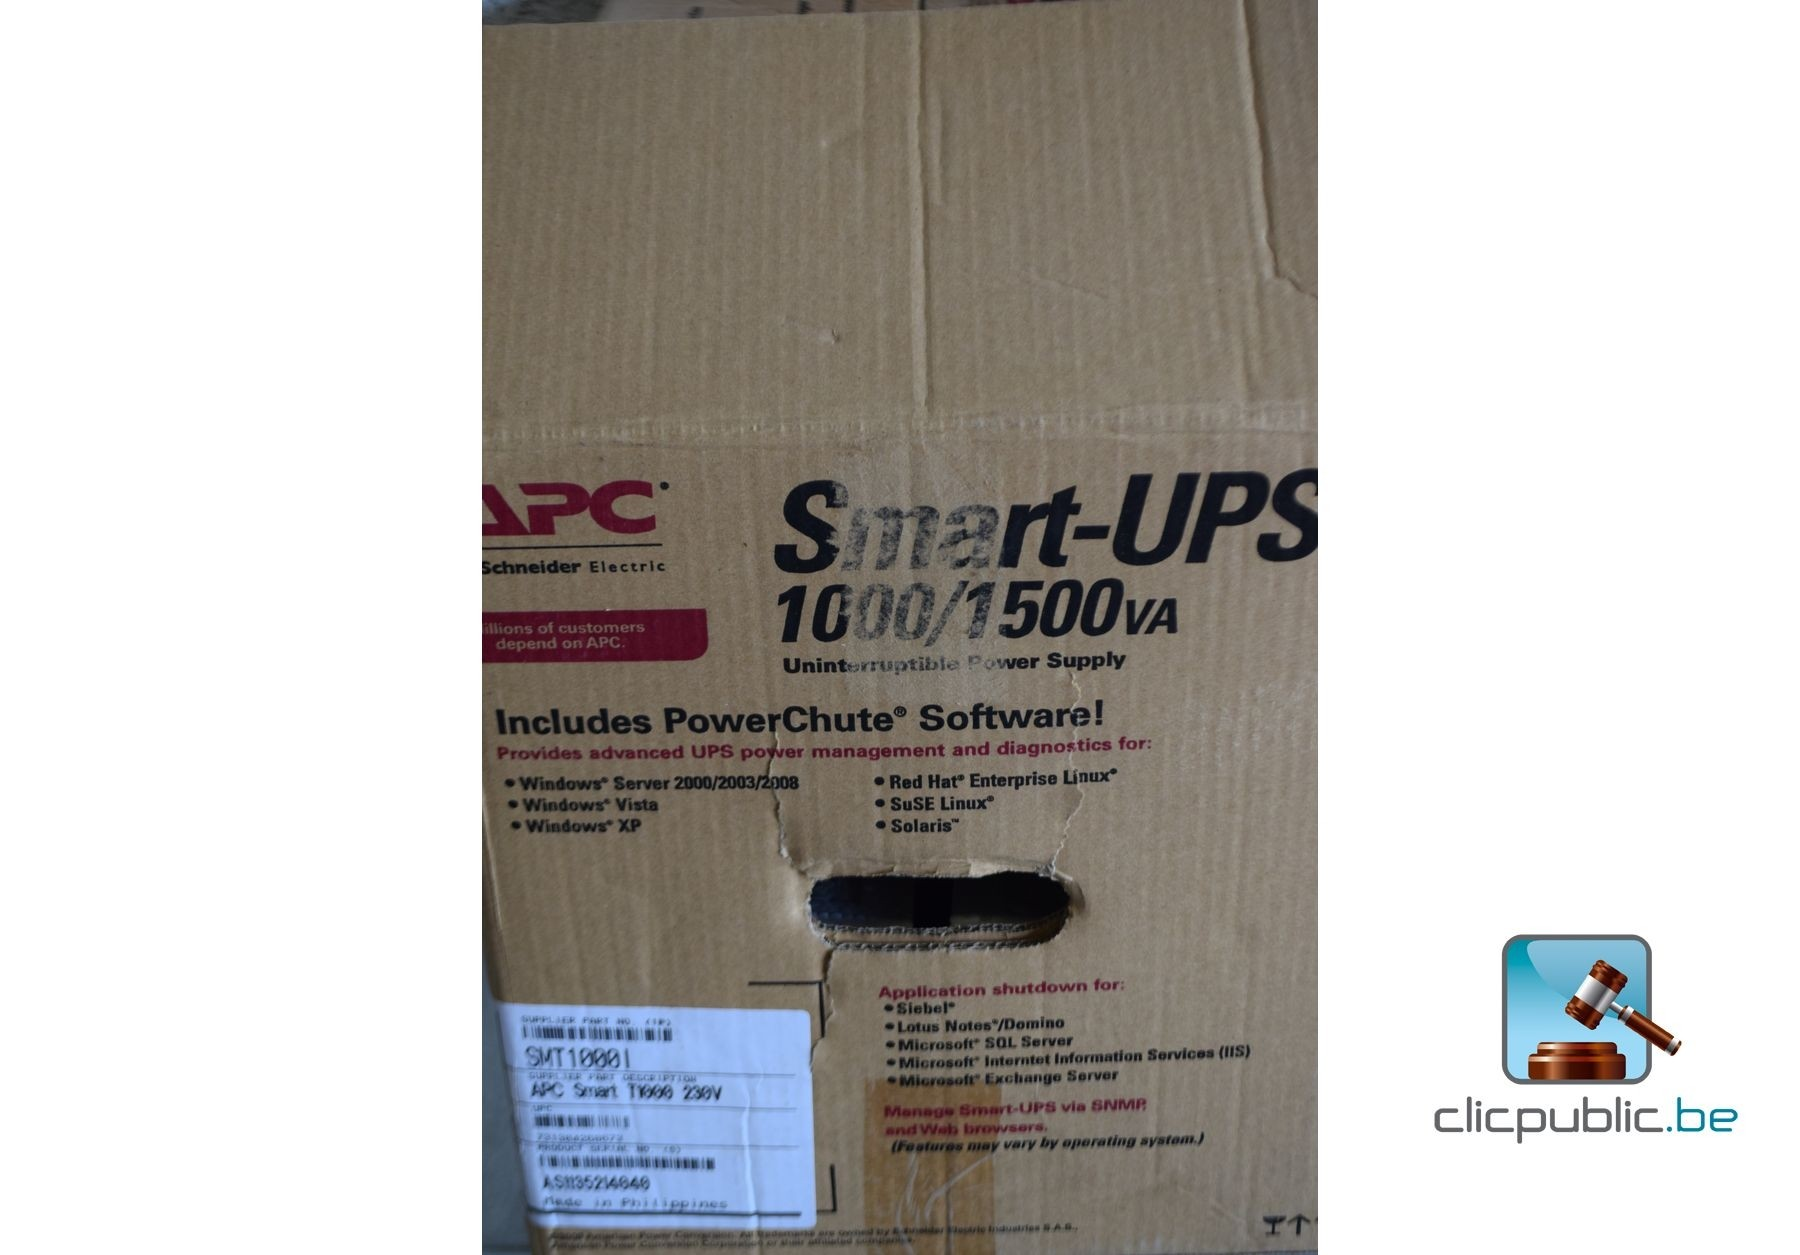 Inverter APC Smart UPS-1000/1500va (ref  18)